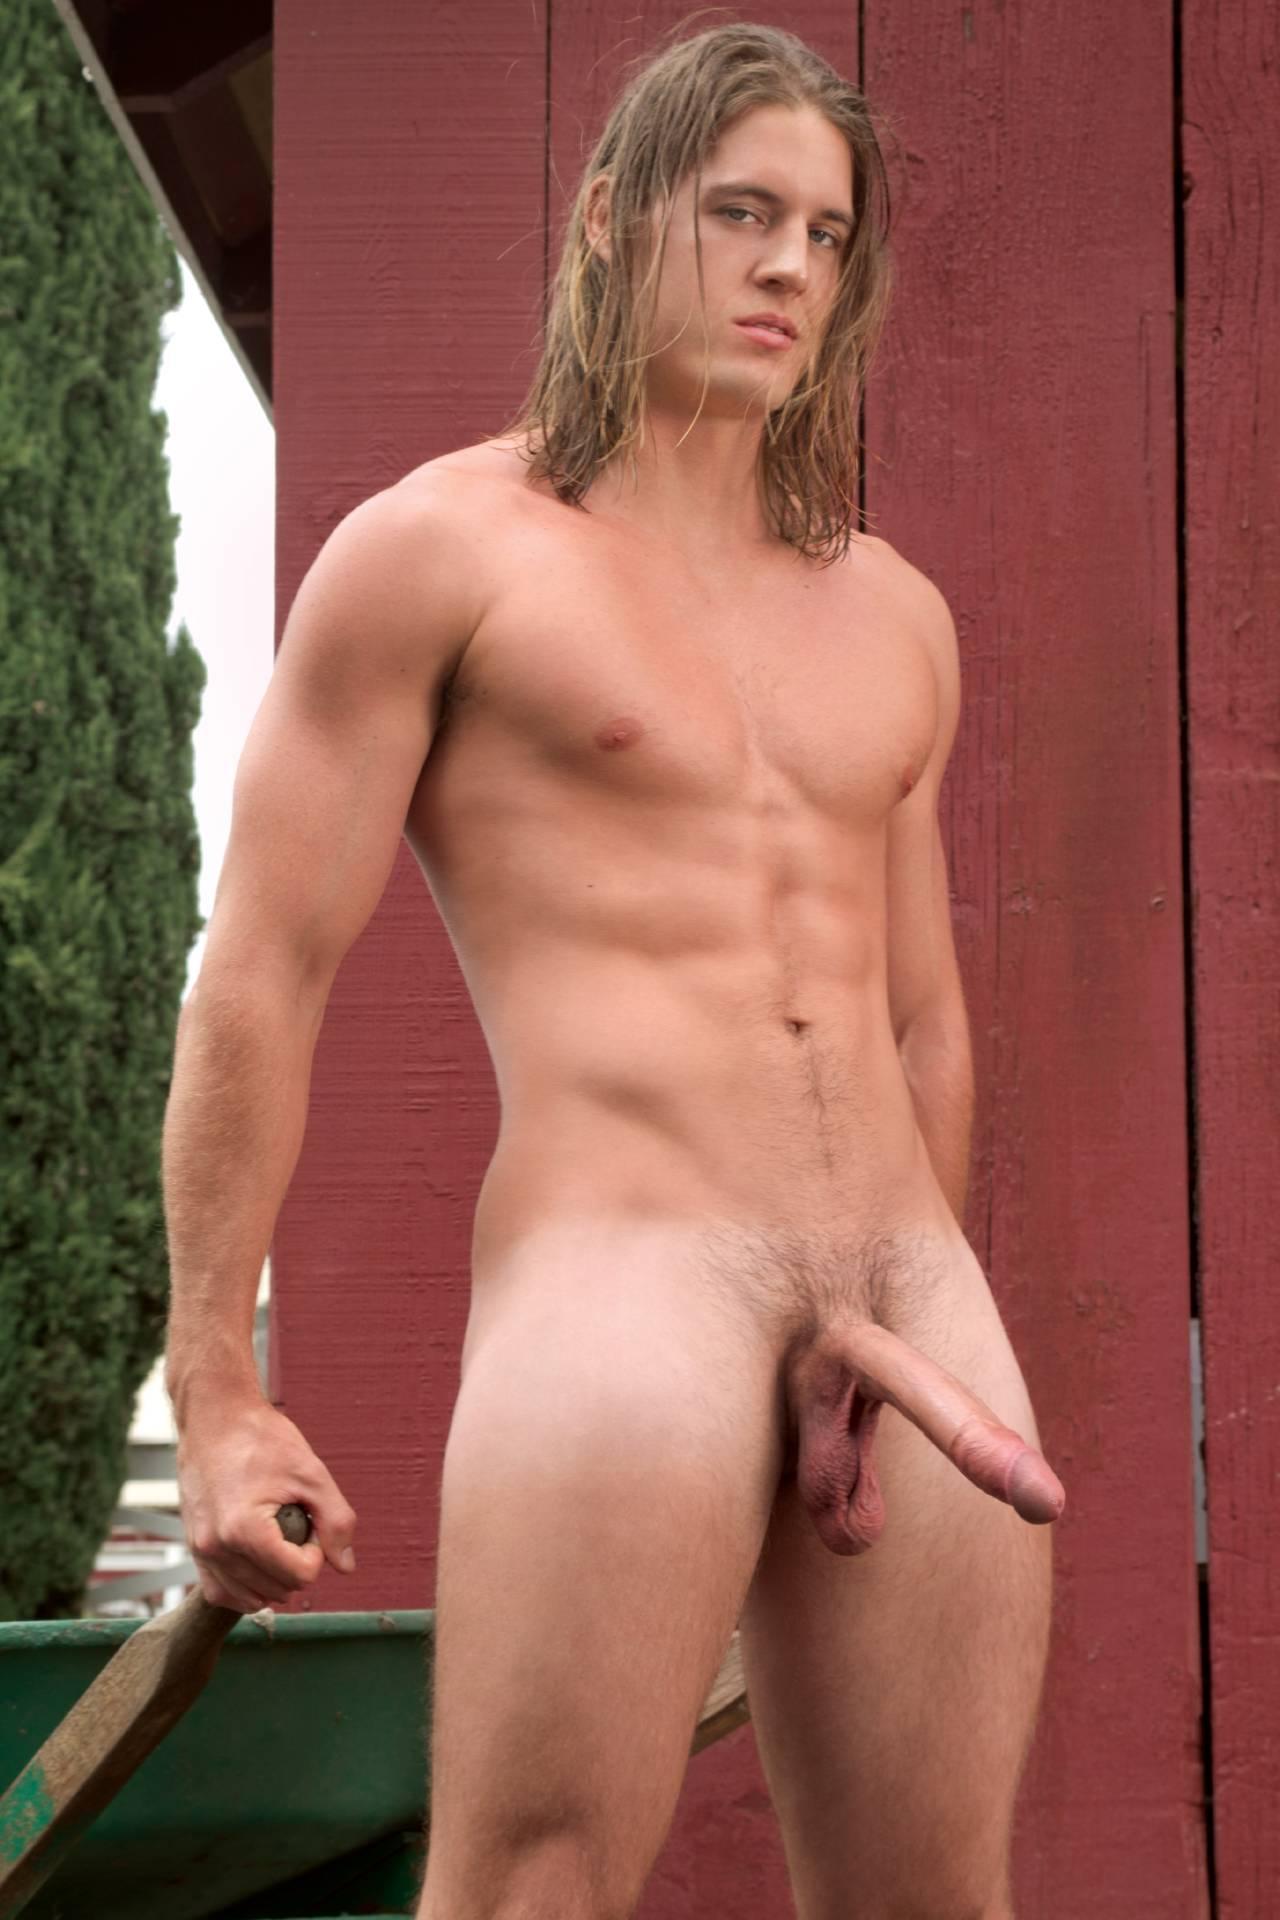 Kip johnson bio gay porn pics sexhound-2247